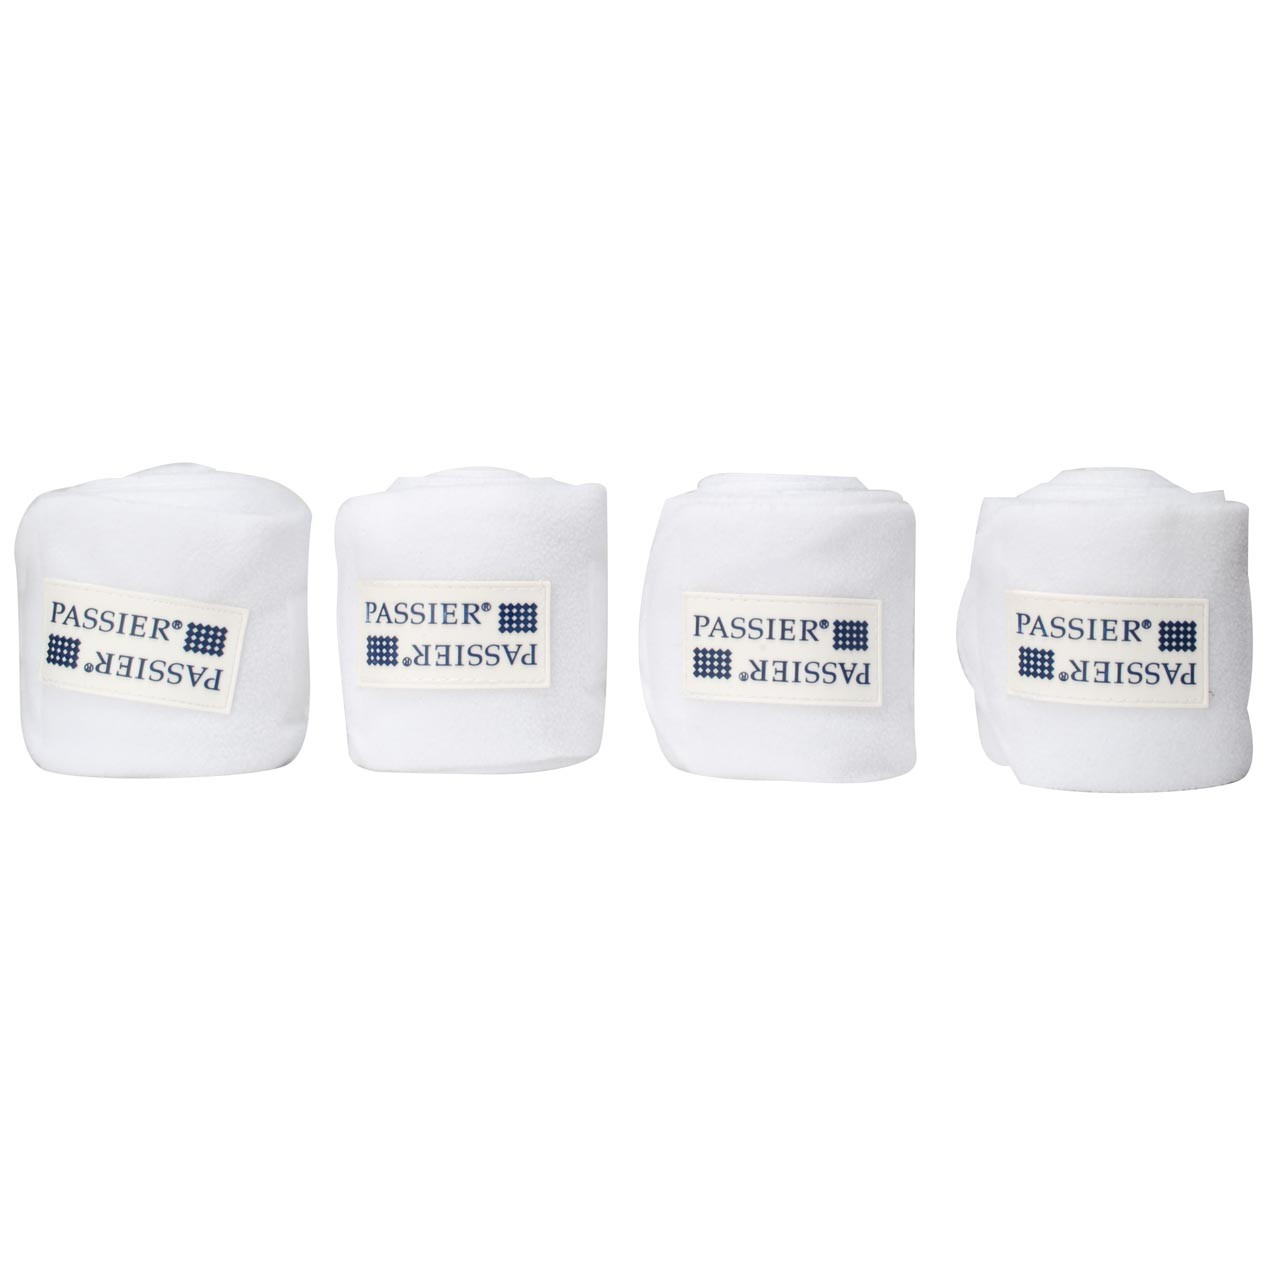 Passier fleece bandages wit maat:full